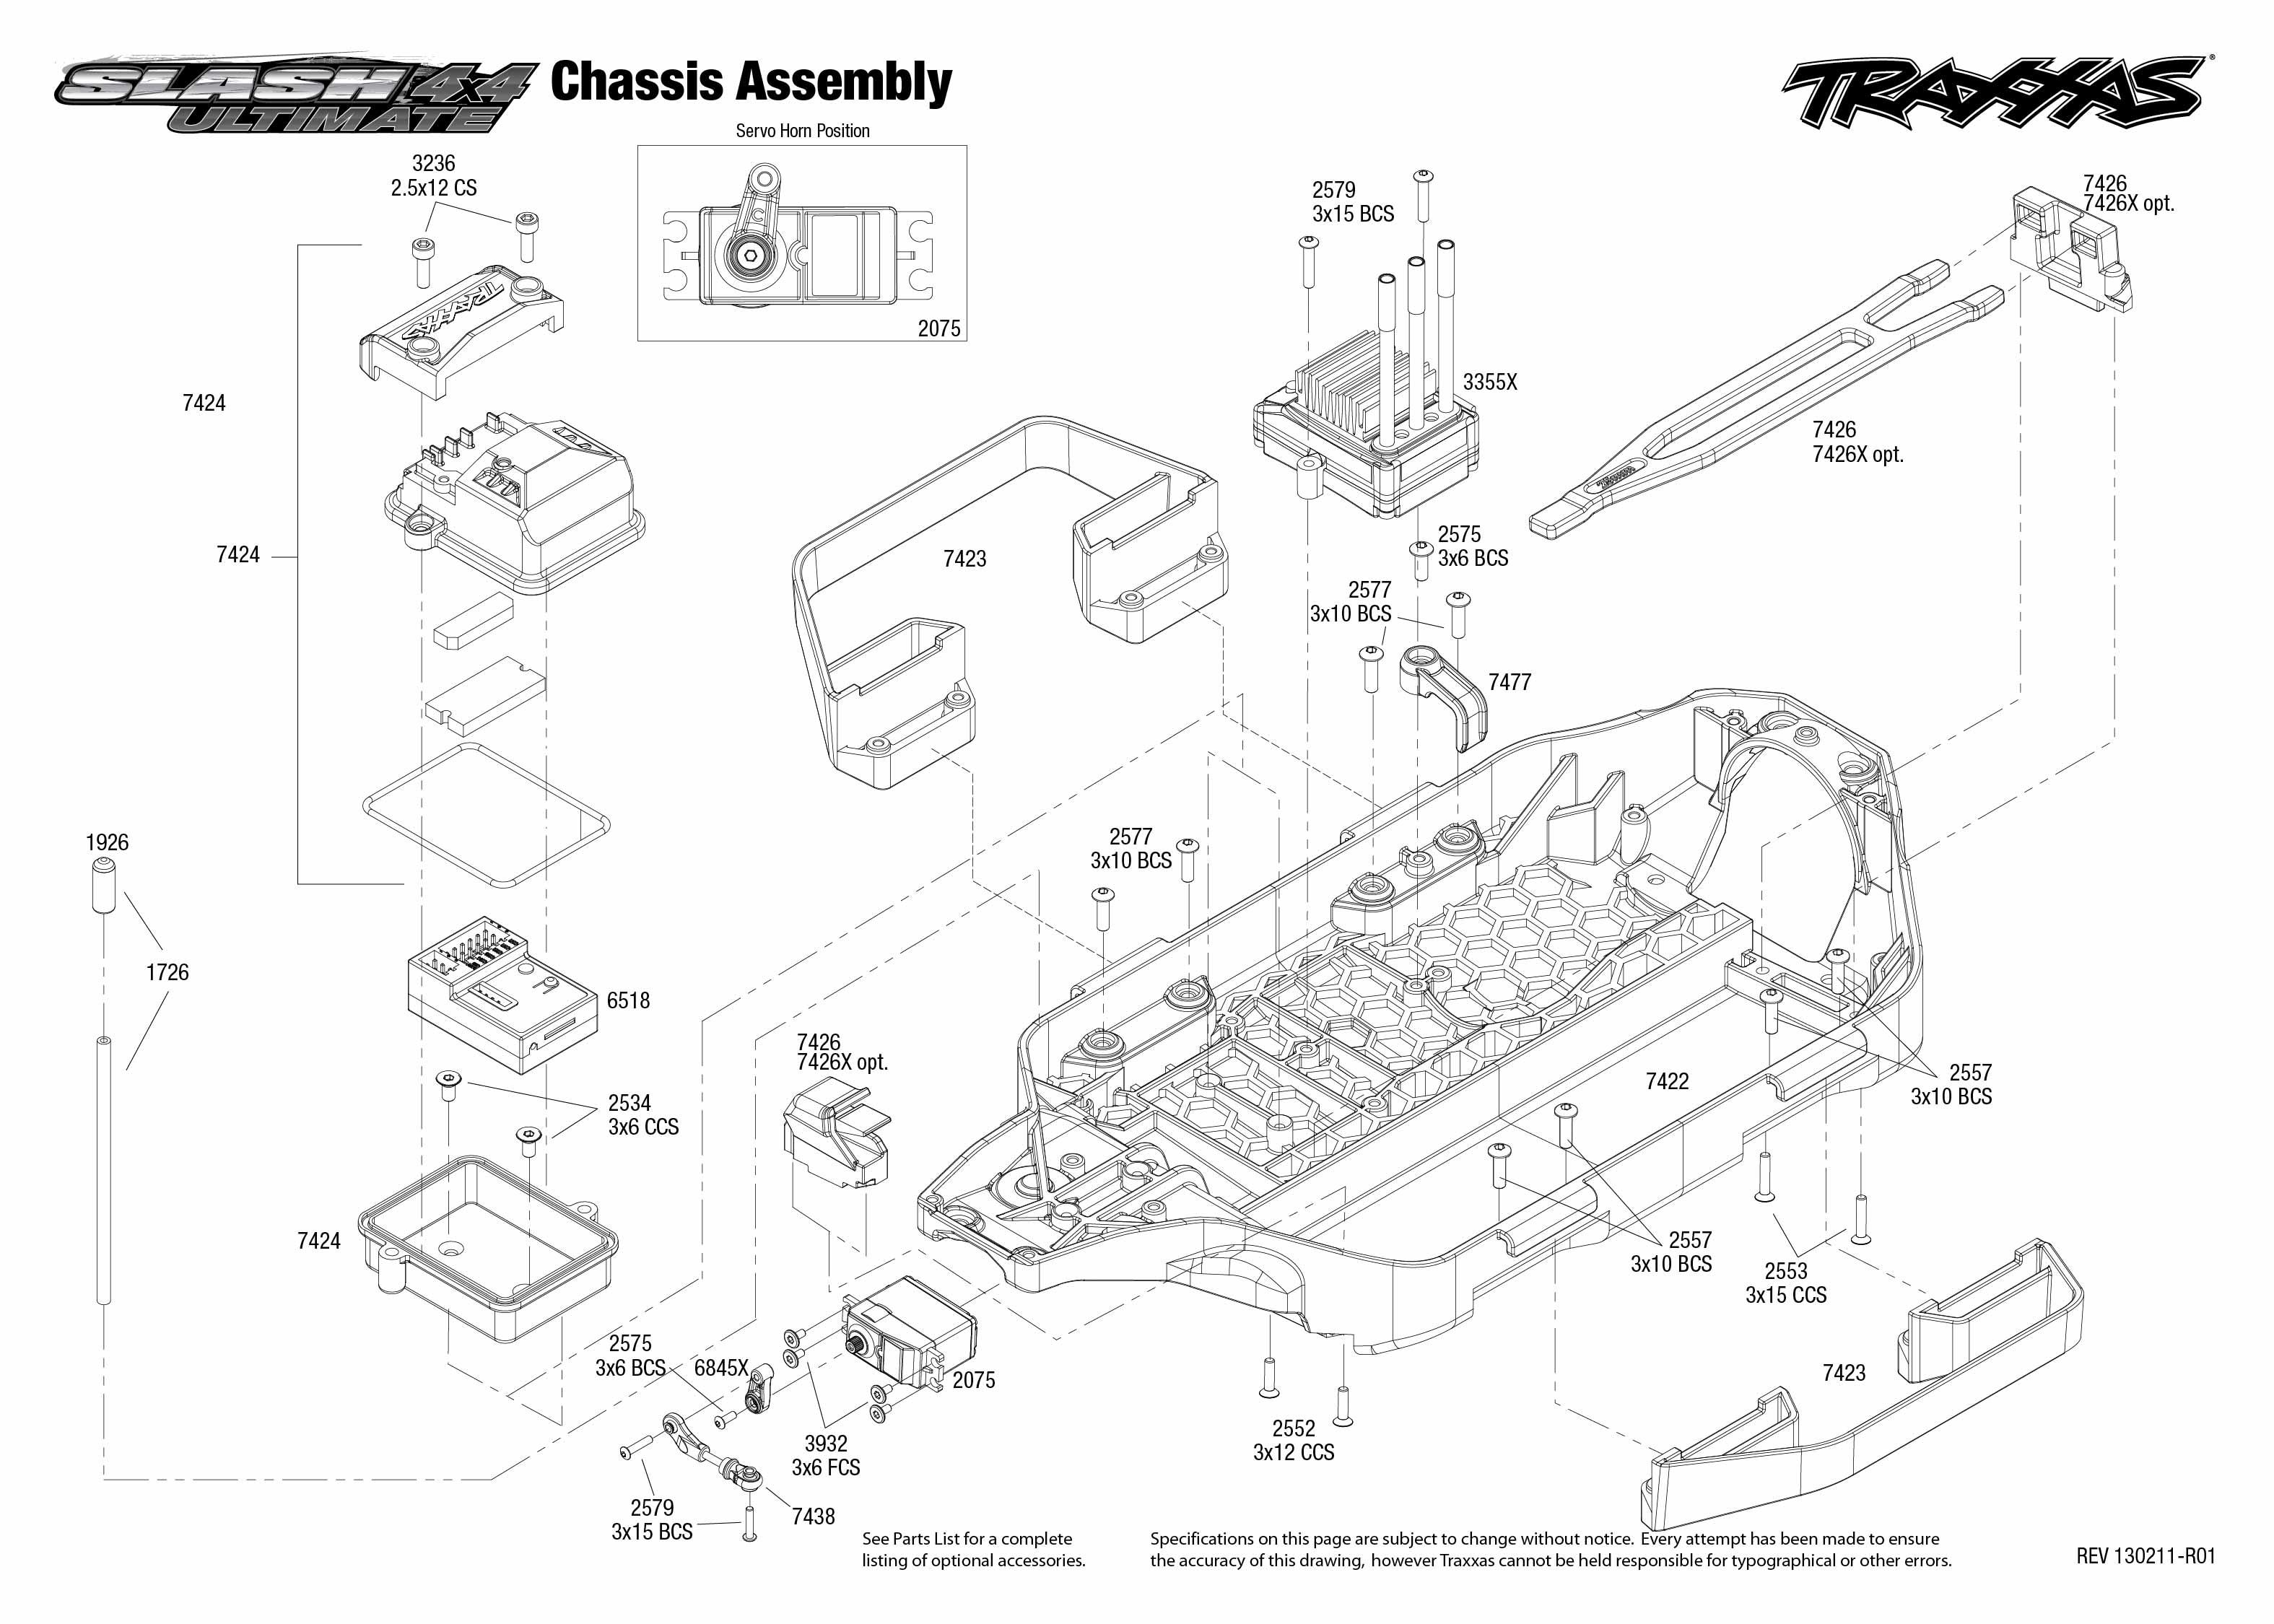 ... slash 4x4 parts list www topsimages com traxxas slash 4x4 ultimate wiring  diagram slash schematics application